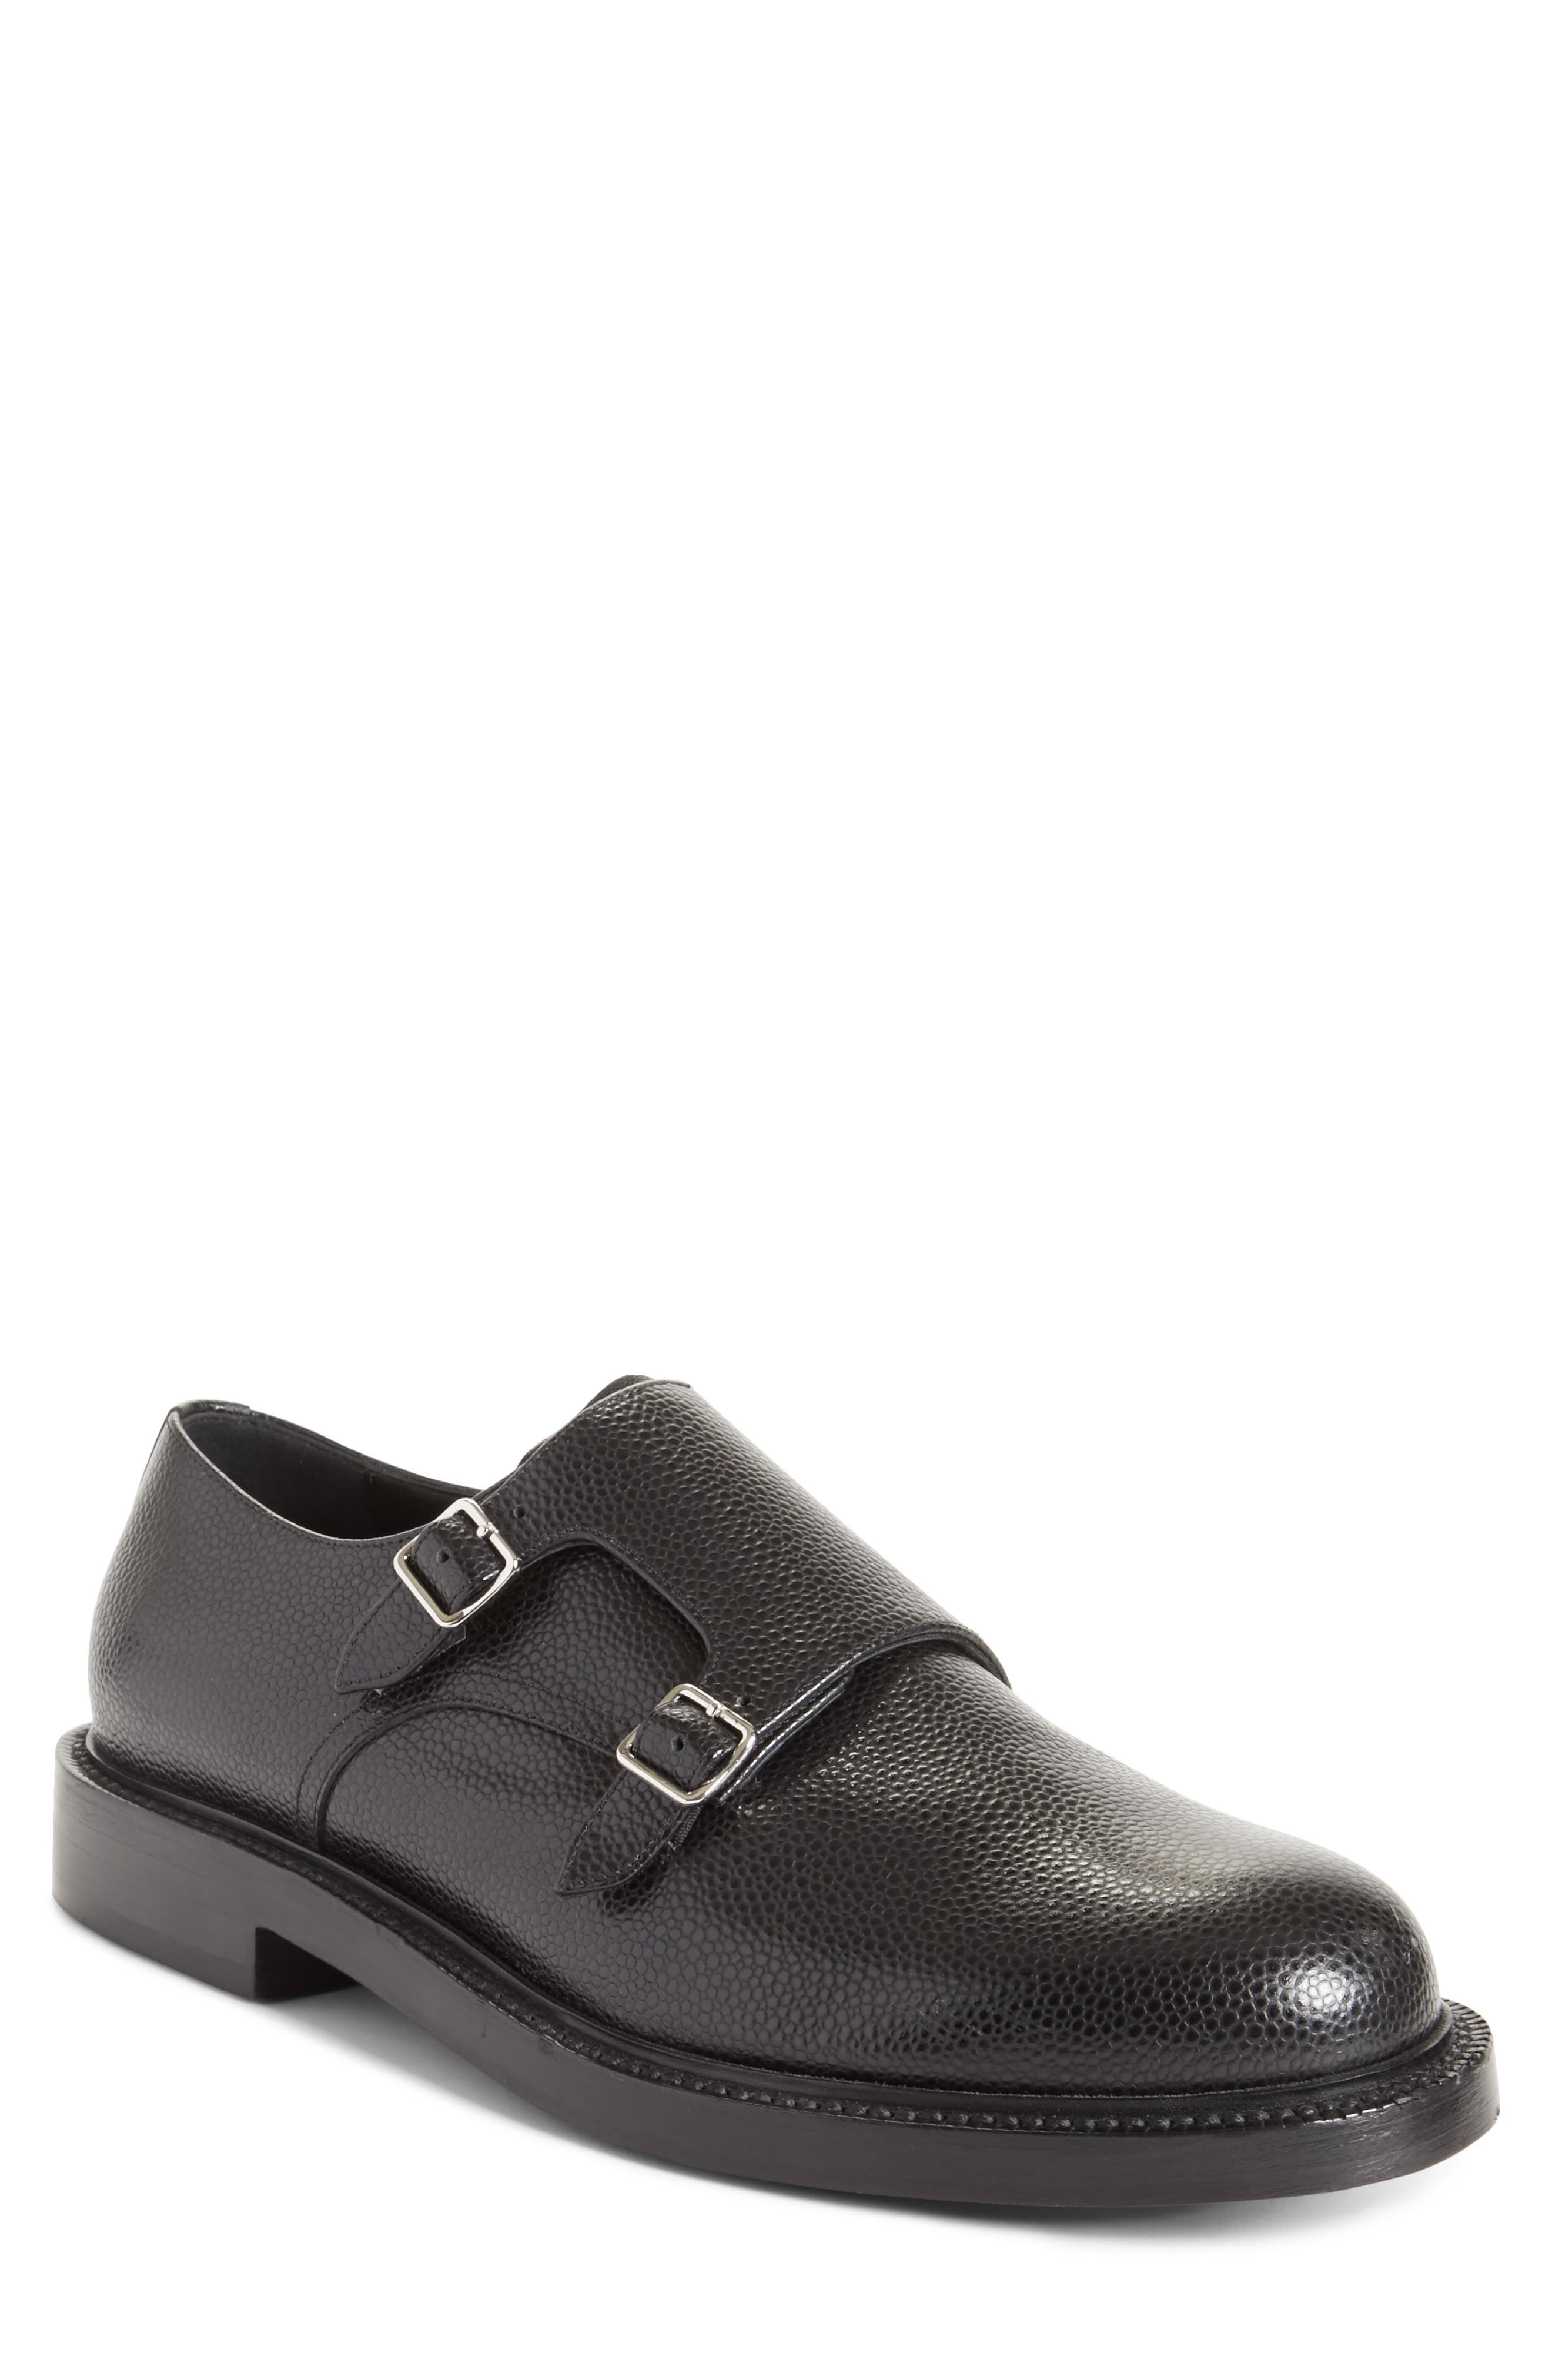 Main Image - Calvin Klein 205W39NYC Hova Double Monk Strap Shoe (Men)